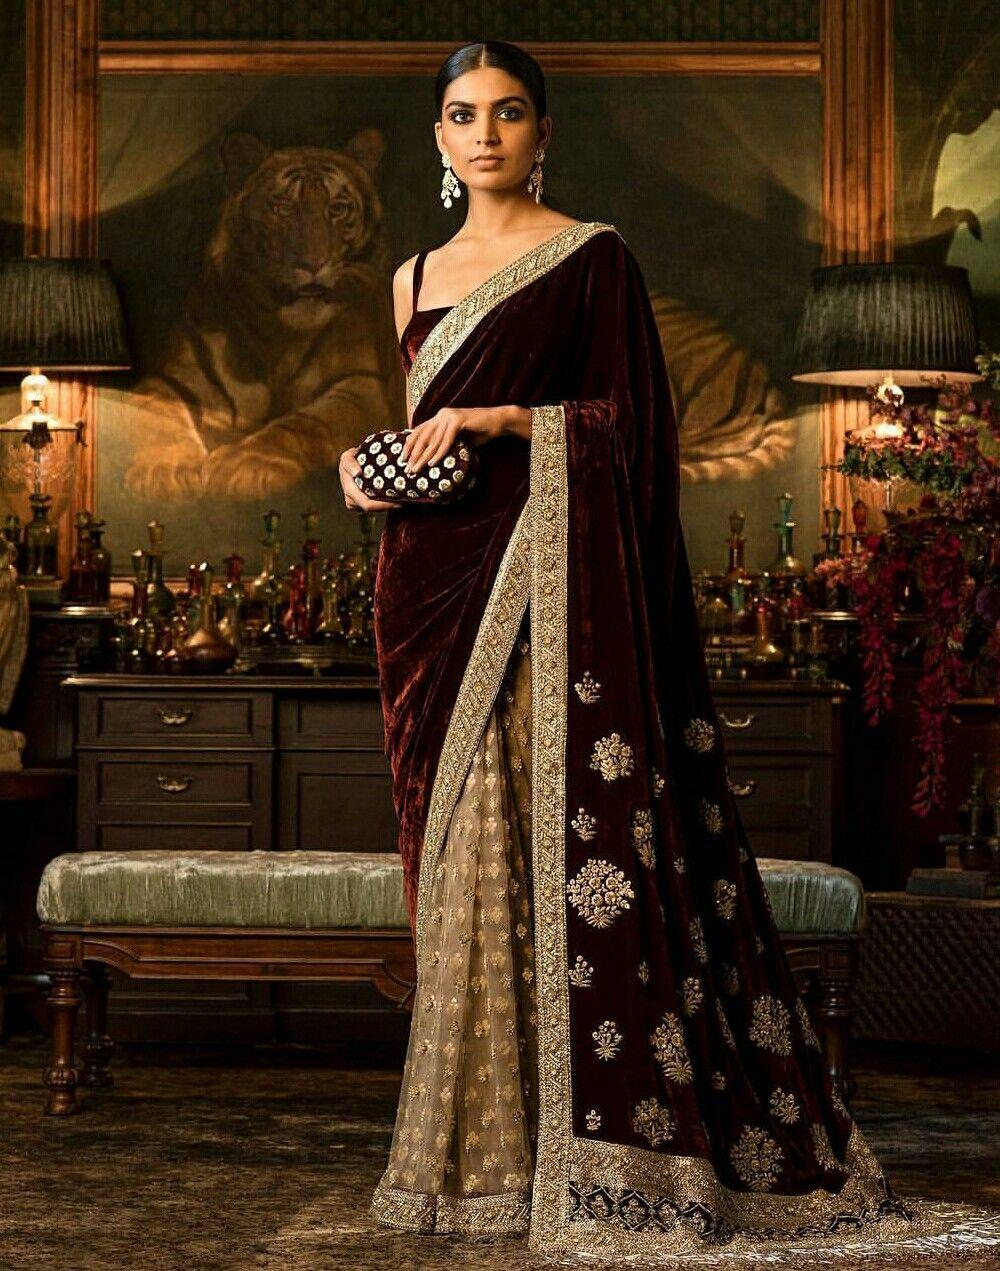 Sabyasachi velvet saree | style & more... | Pinterest